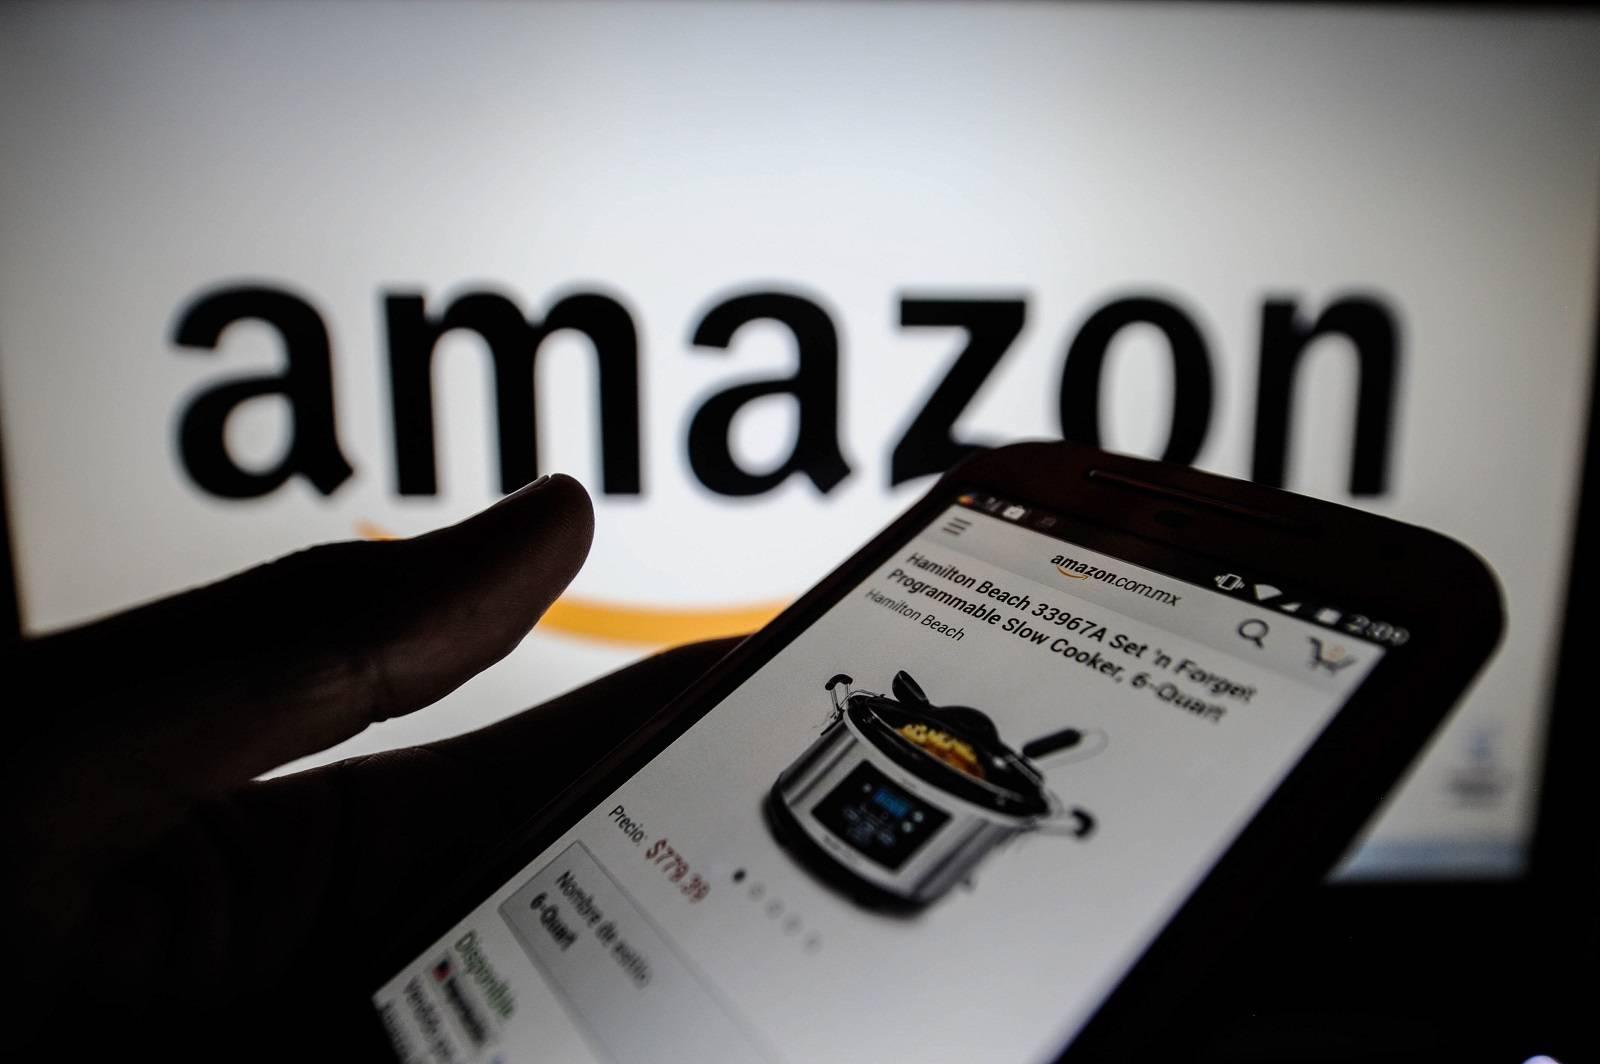 Como Vender na Amazon? Taxas & Tutoriais para ser Vendedor na Amazon (Imagem: Google)